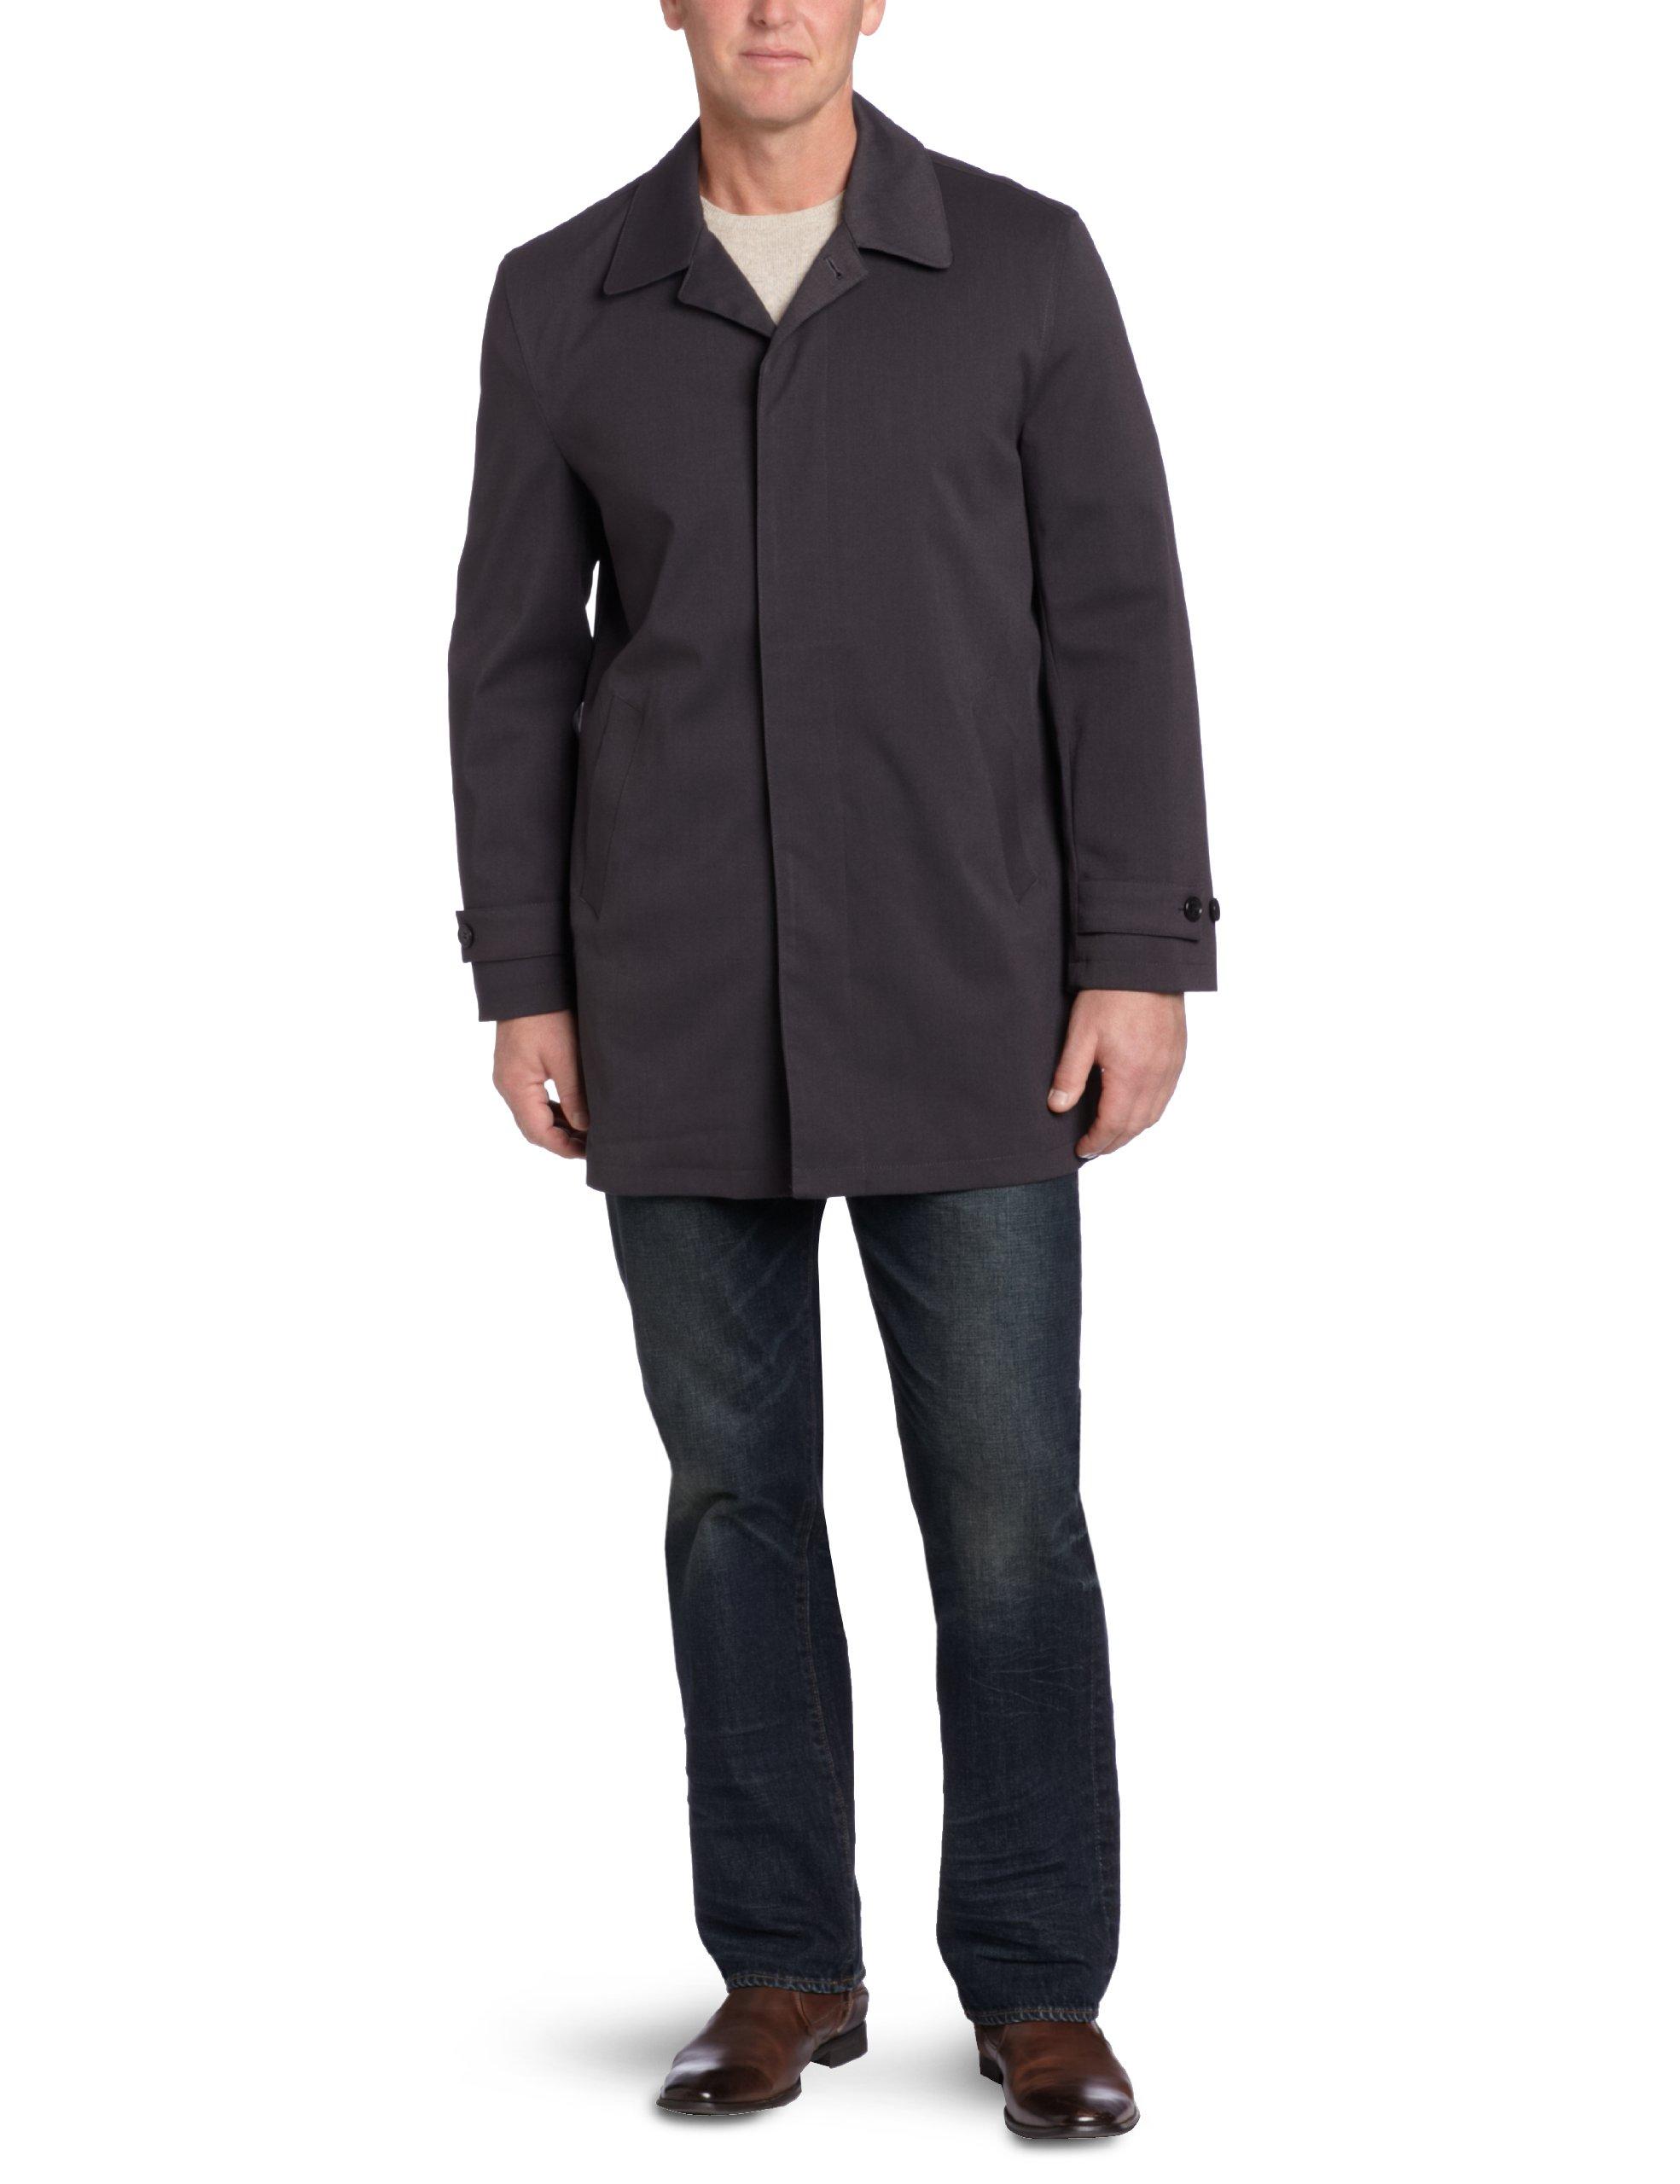 Michael Kors Men's Patterson Rain Coat, Charcoal/Black, 46 Regular